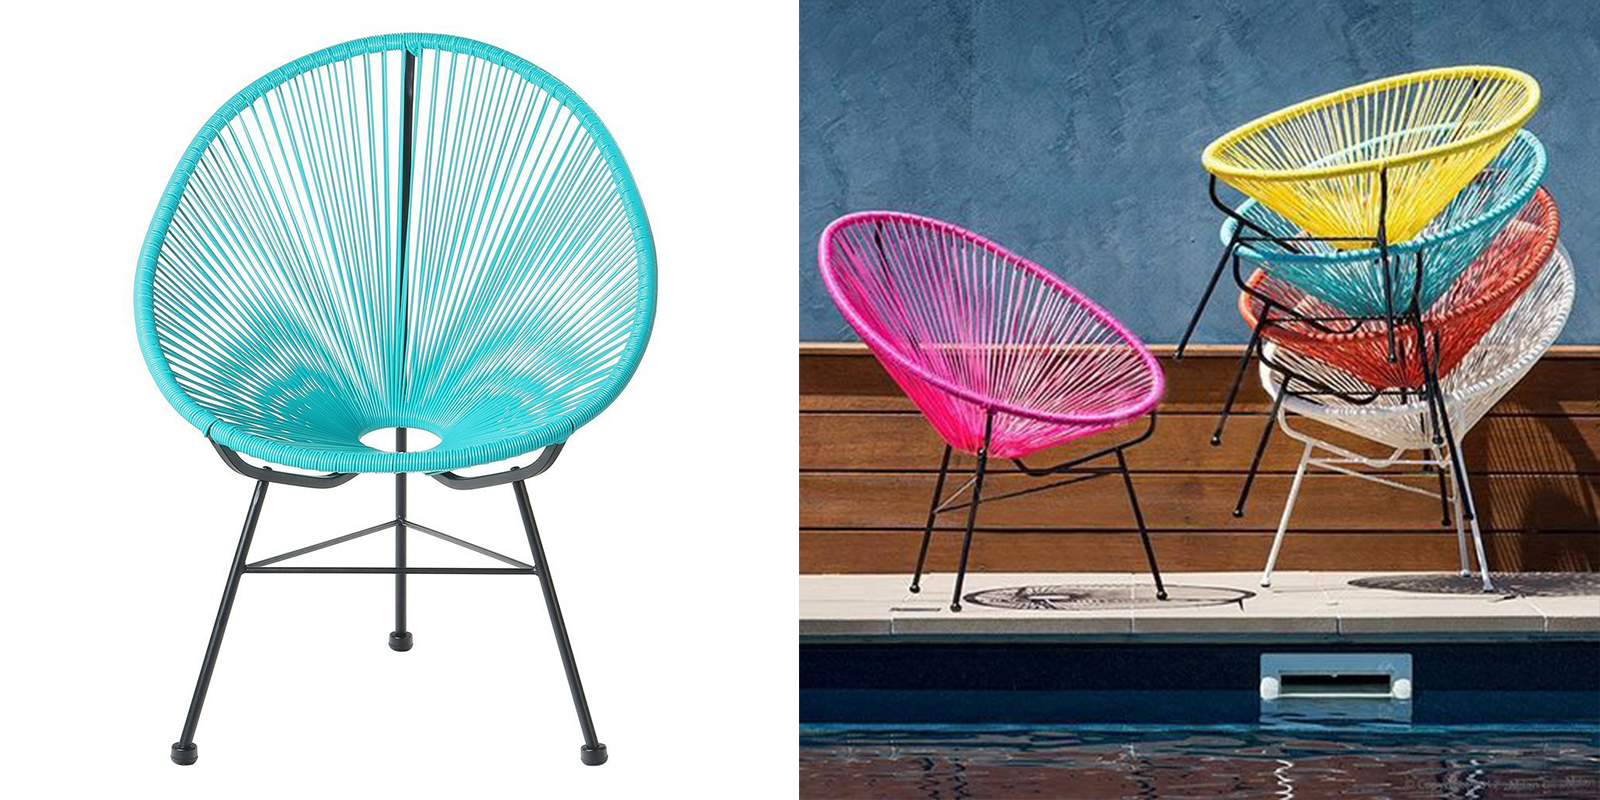 Patio Chair - Mayan Hammock Lounge Chair